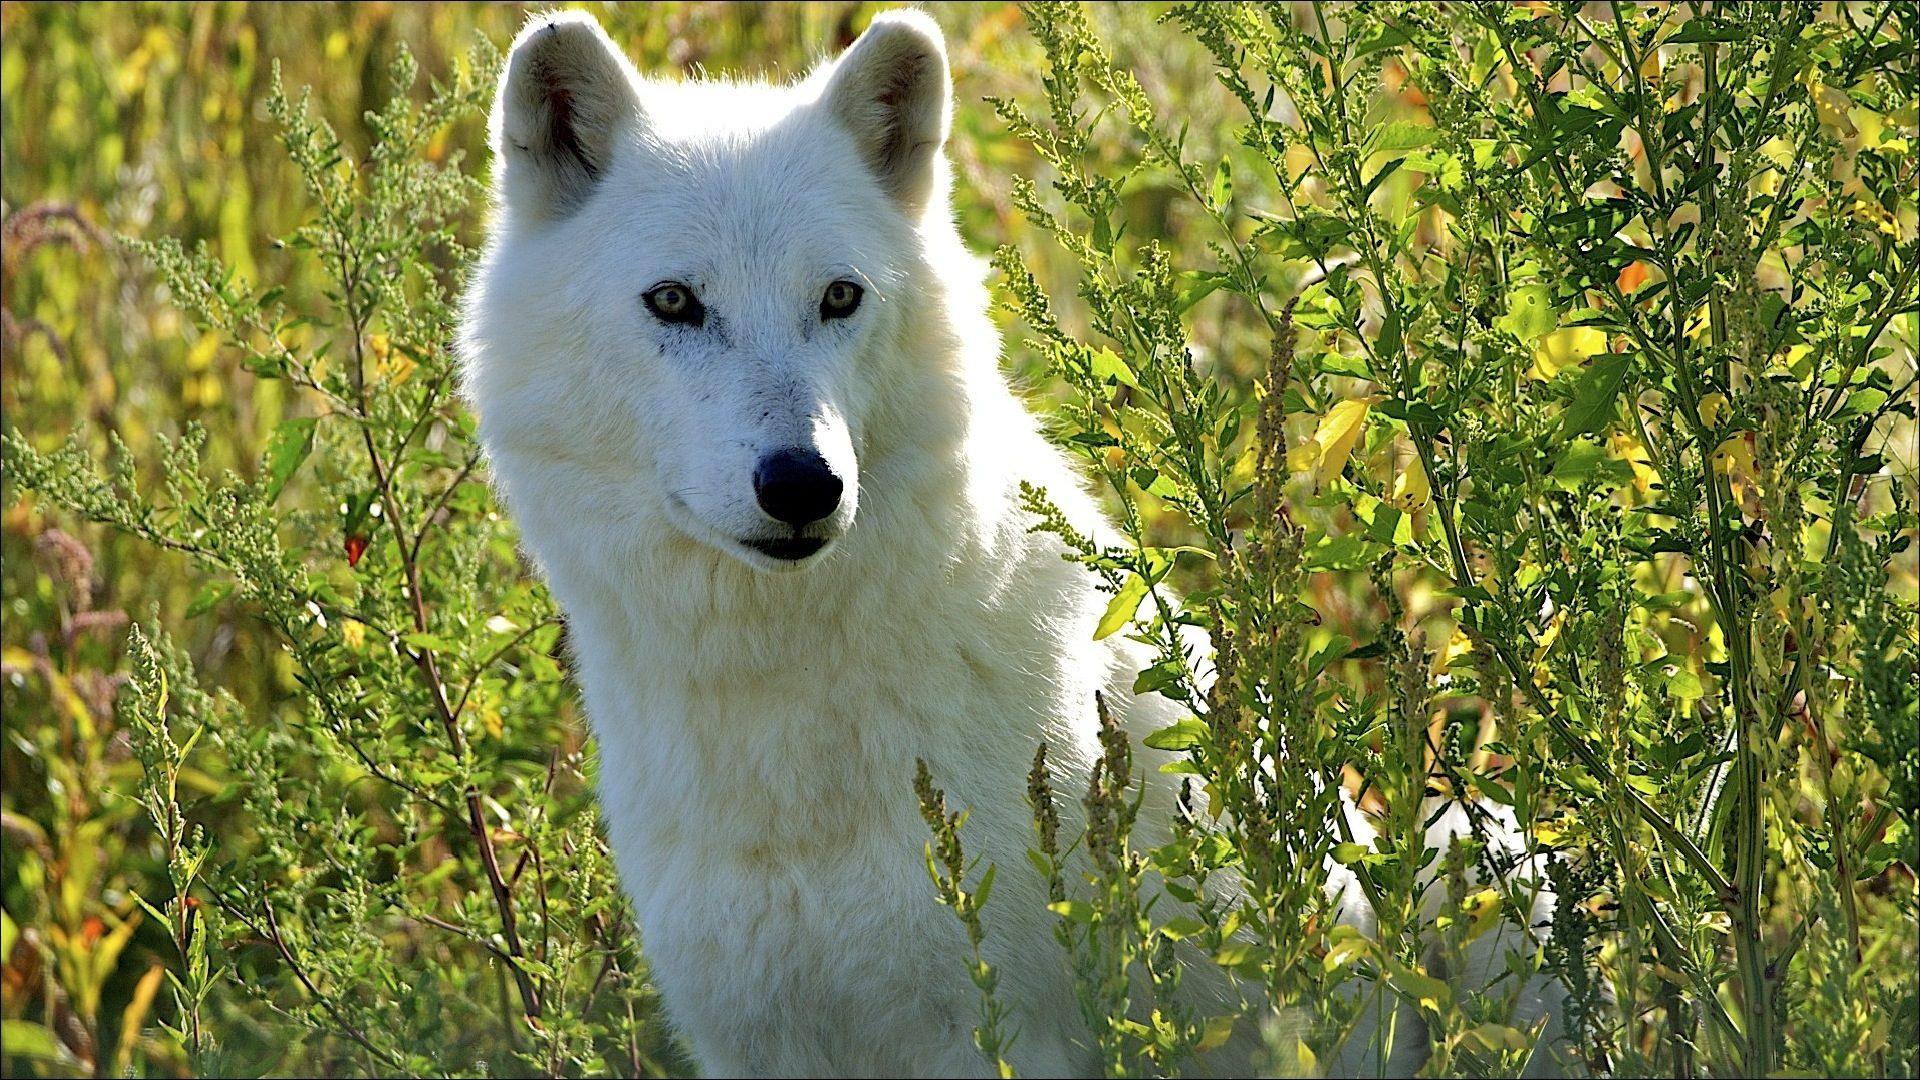 Картинки Волк, скачать заставки белый ...: xorst.ru/oboi?view=detail&id=5426